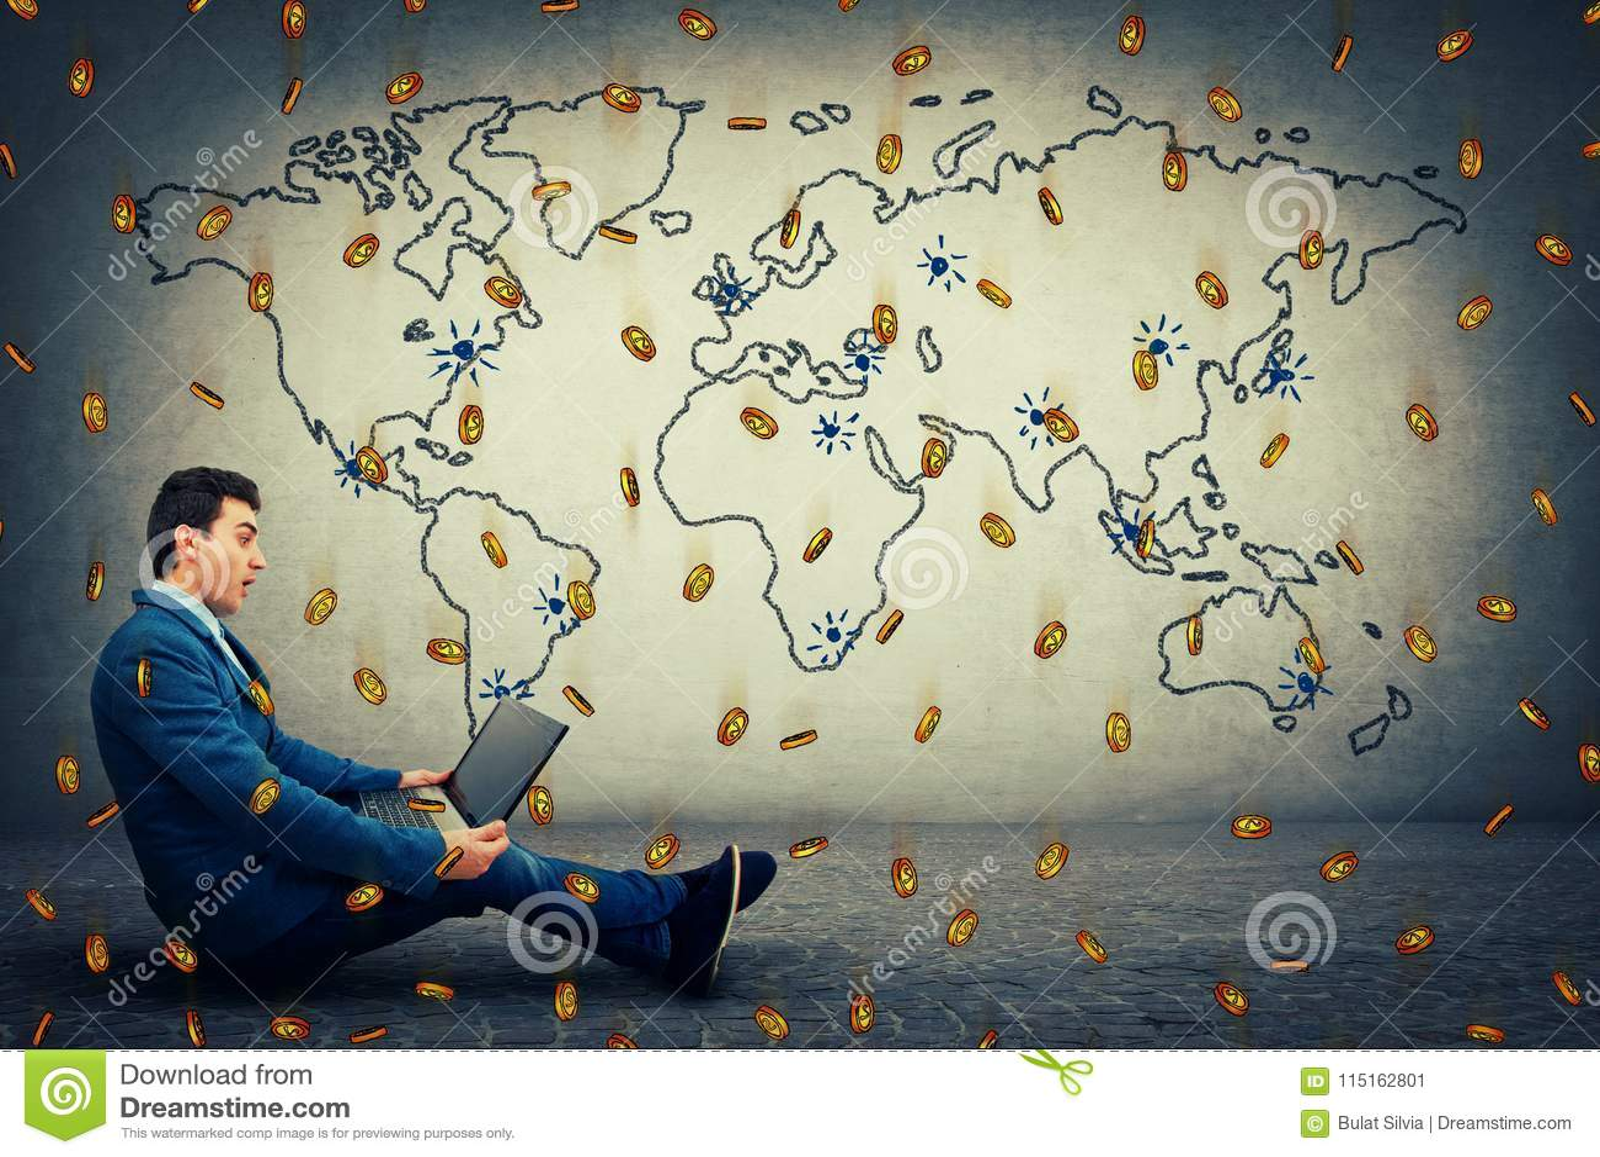 Globale virtuelle Währung